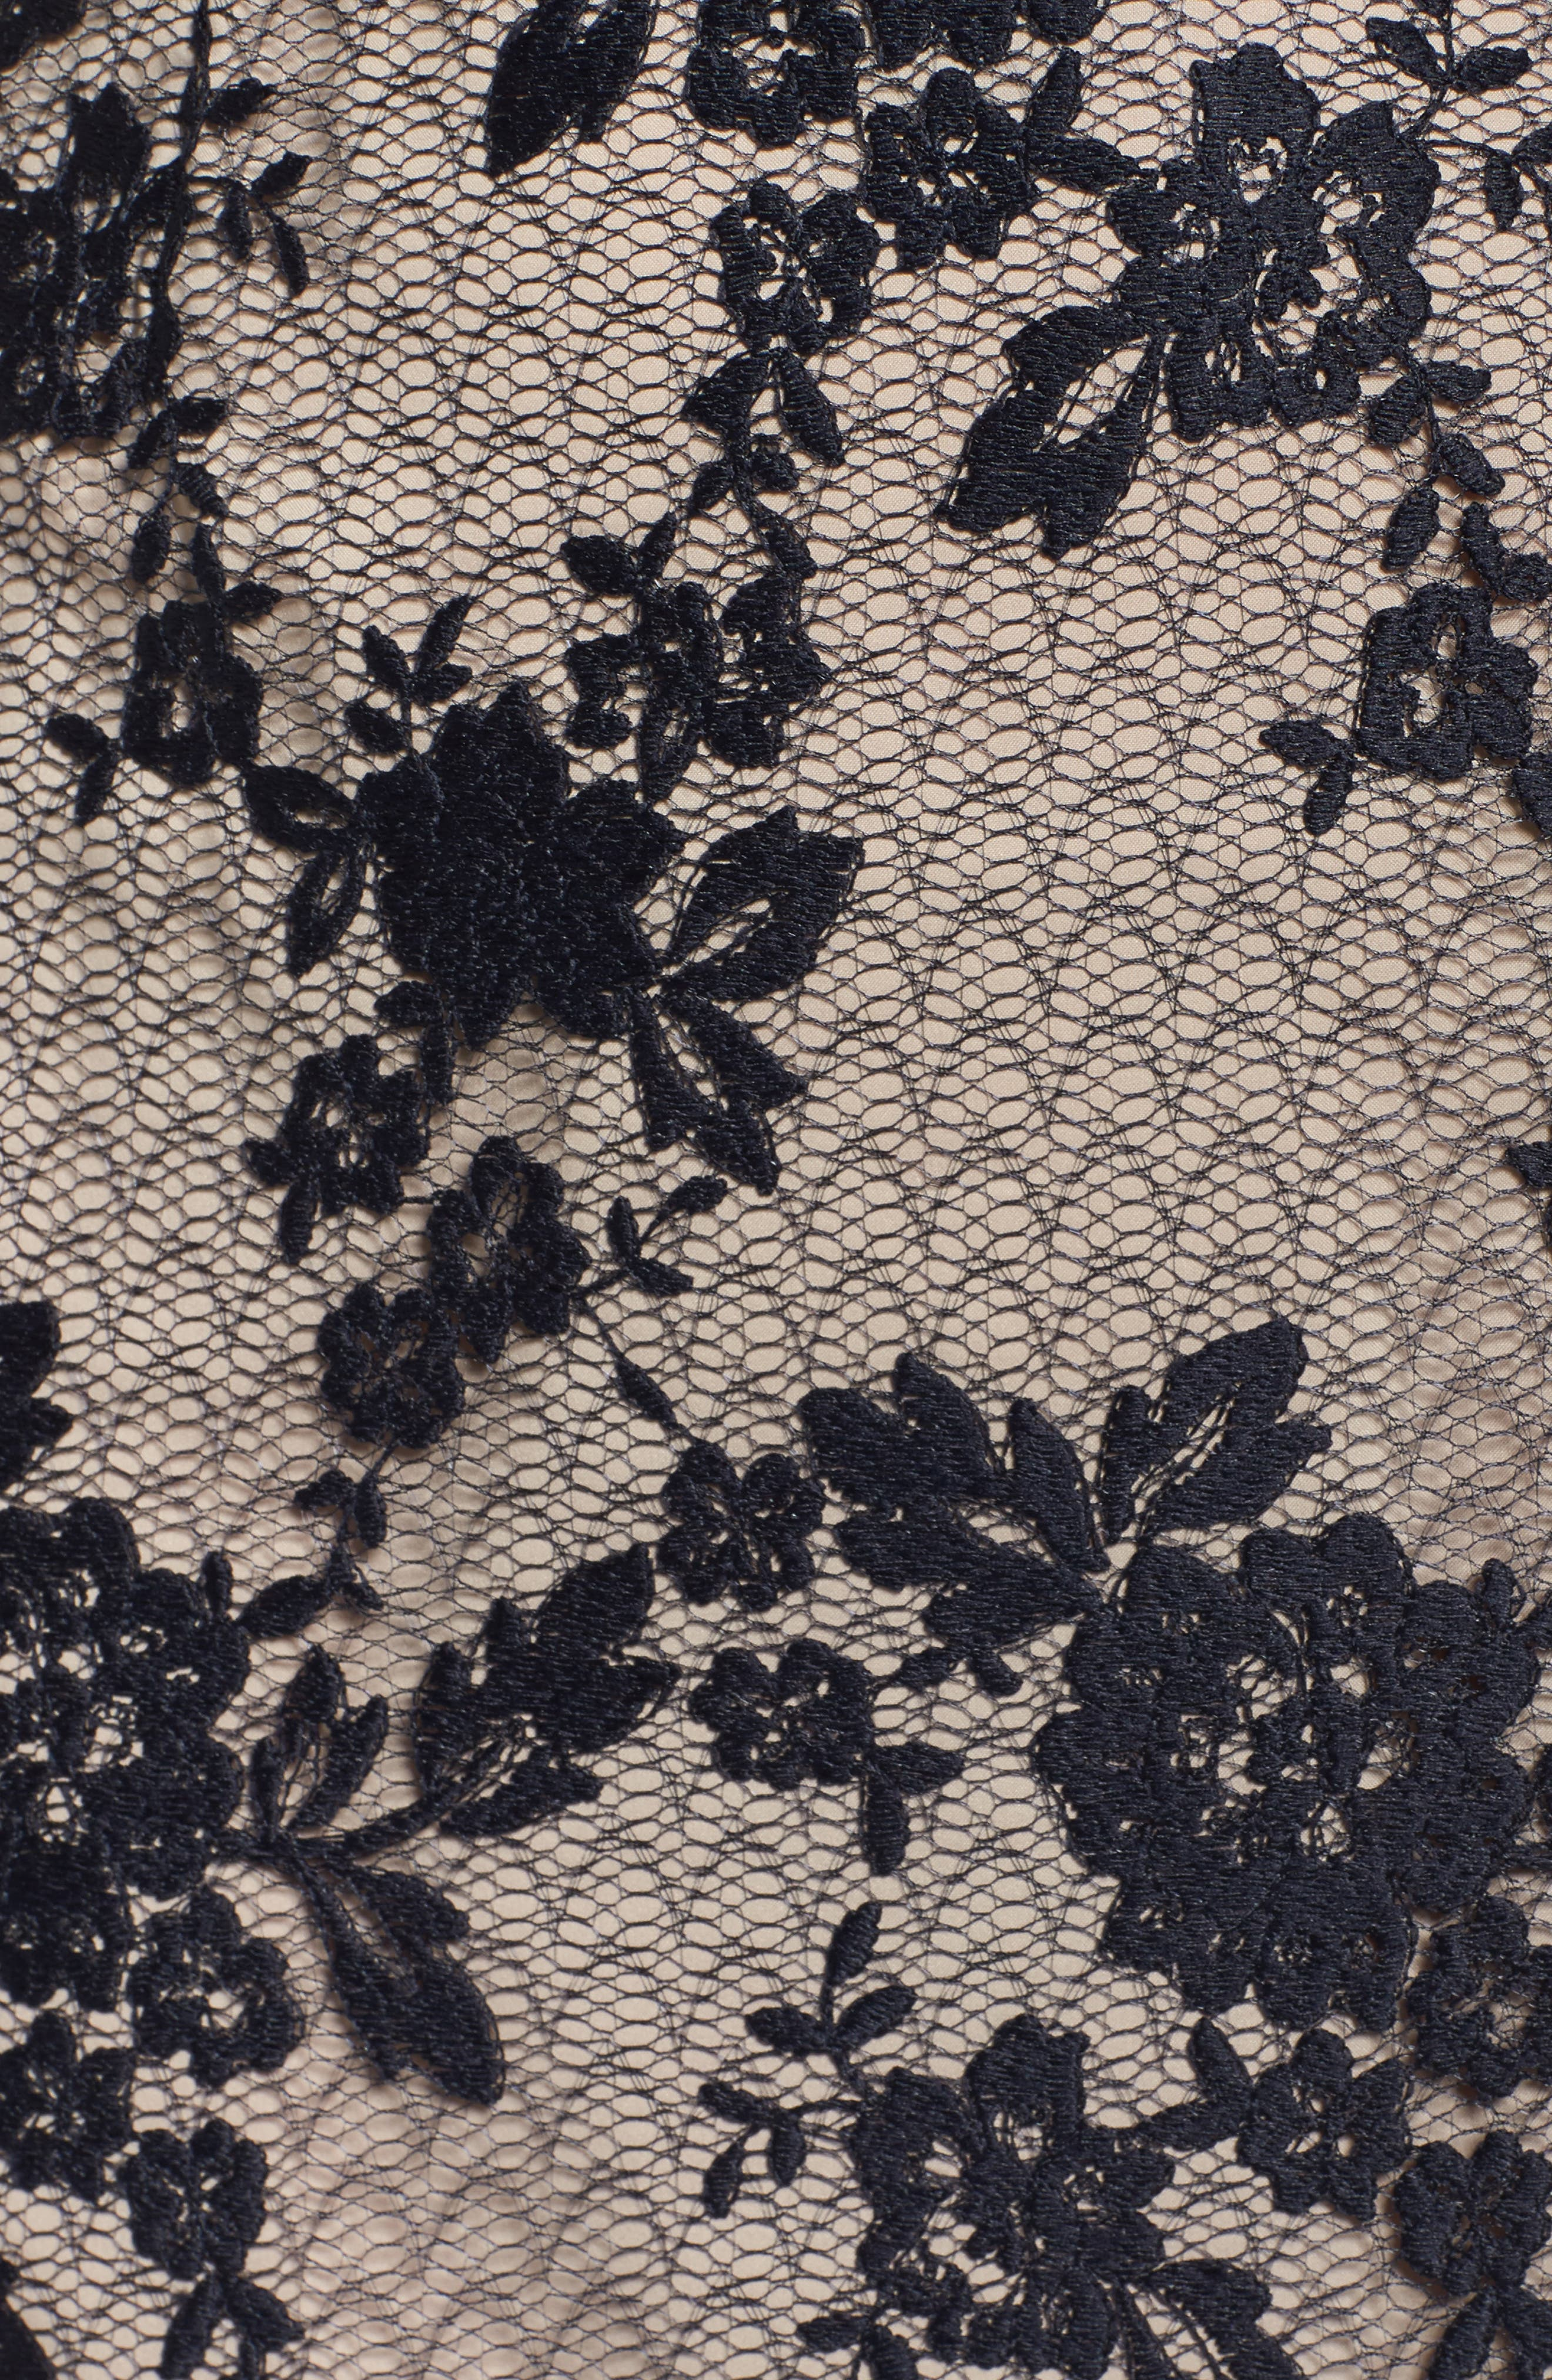 Lace Sheath Dress,                             Alternate thumbnail 5, color,                             402